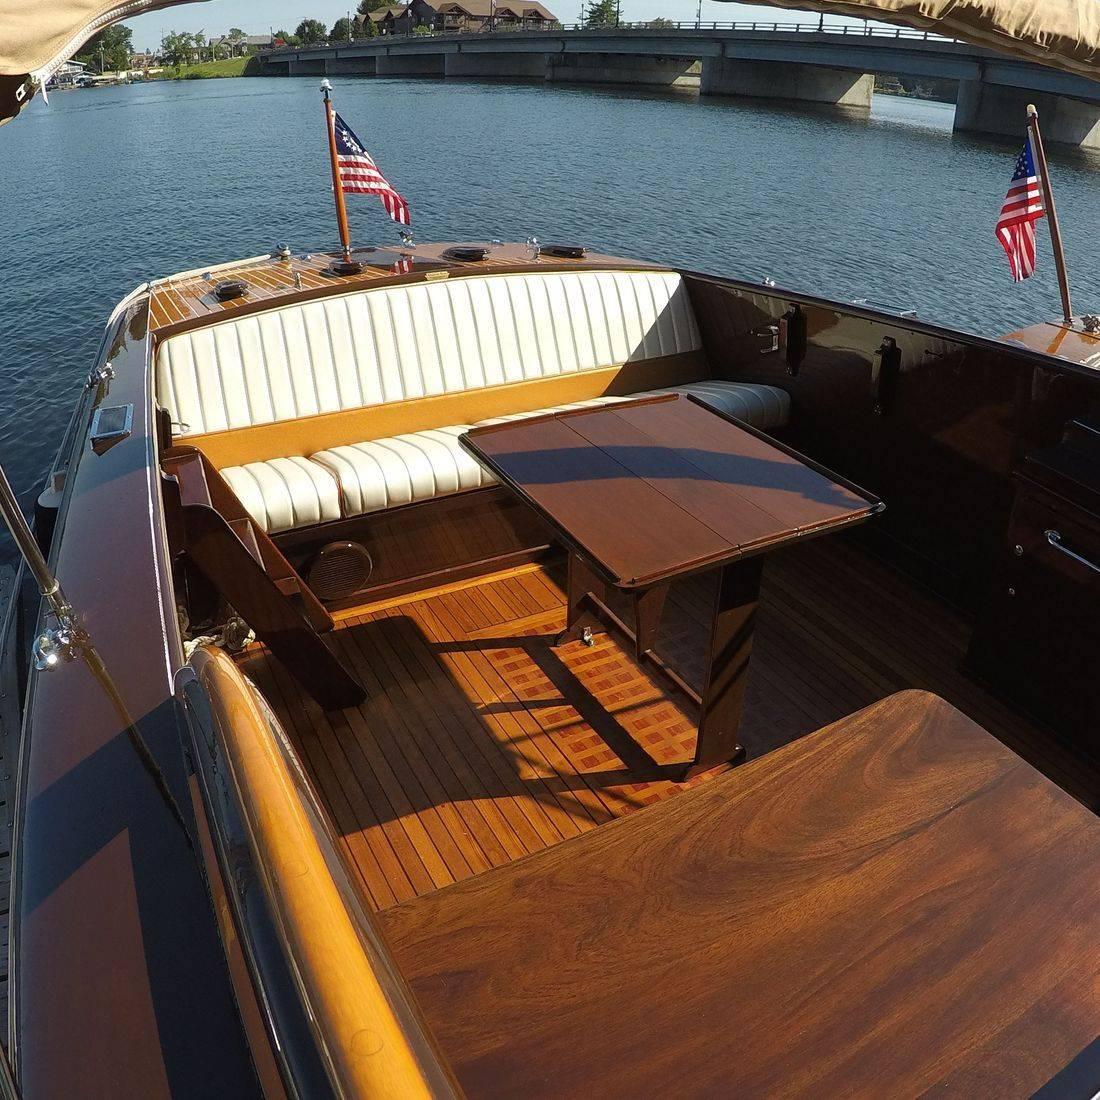 27' Shepherd by Bergersen Boat wins 'Captain's Choice Award'